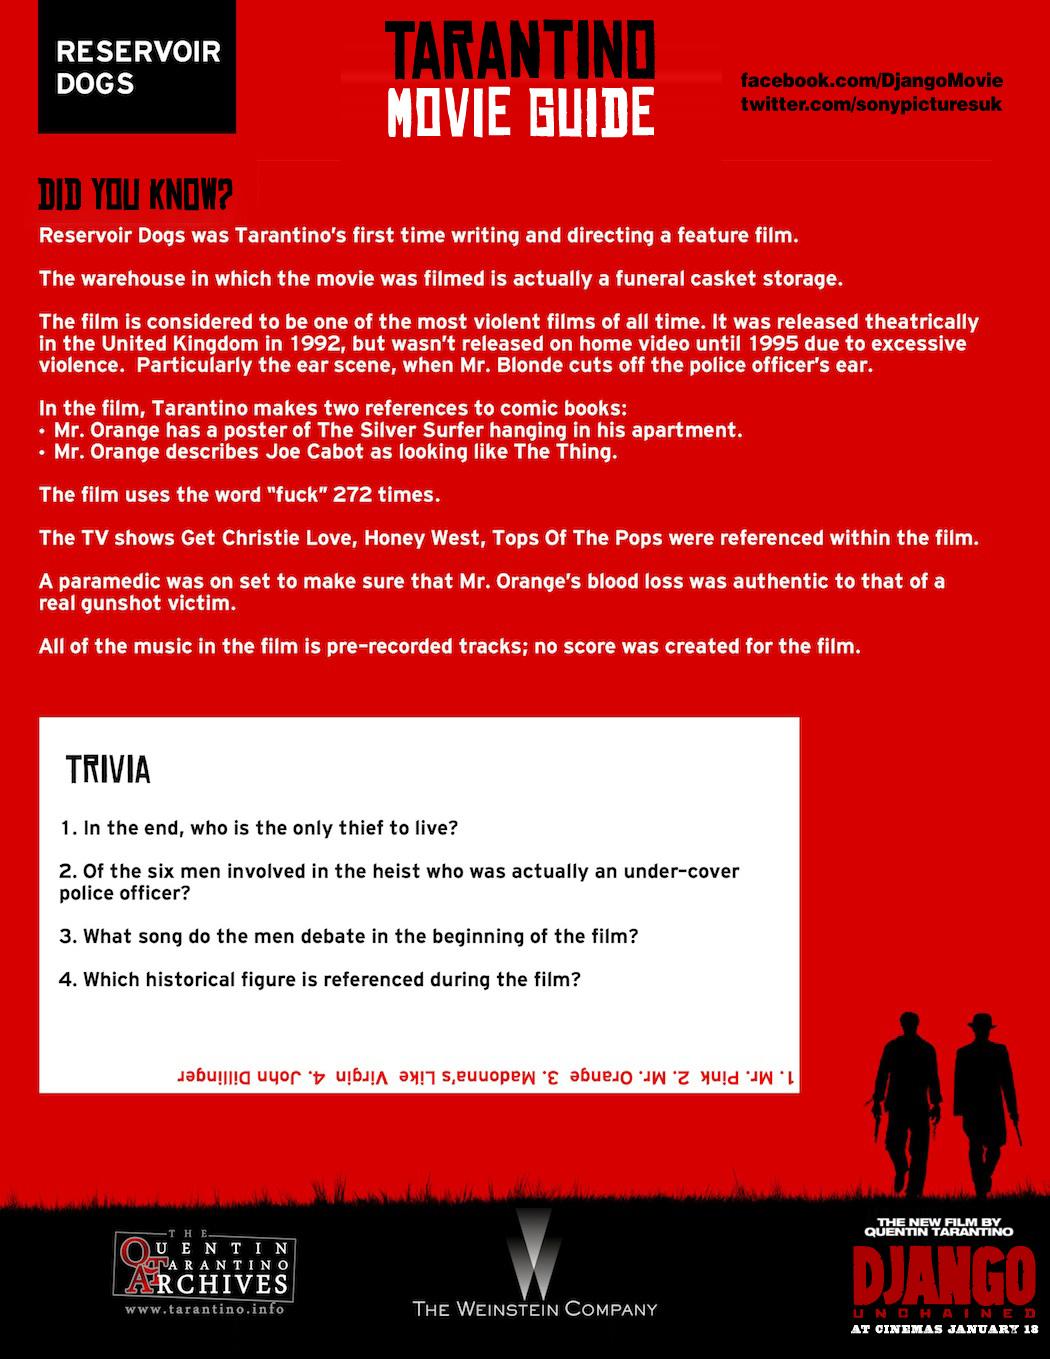 Tarantino Movie Guide – Reservoir Dogs